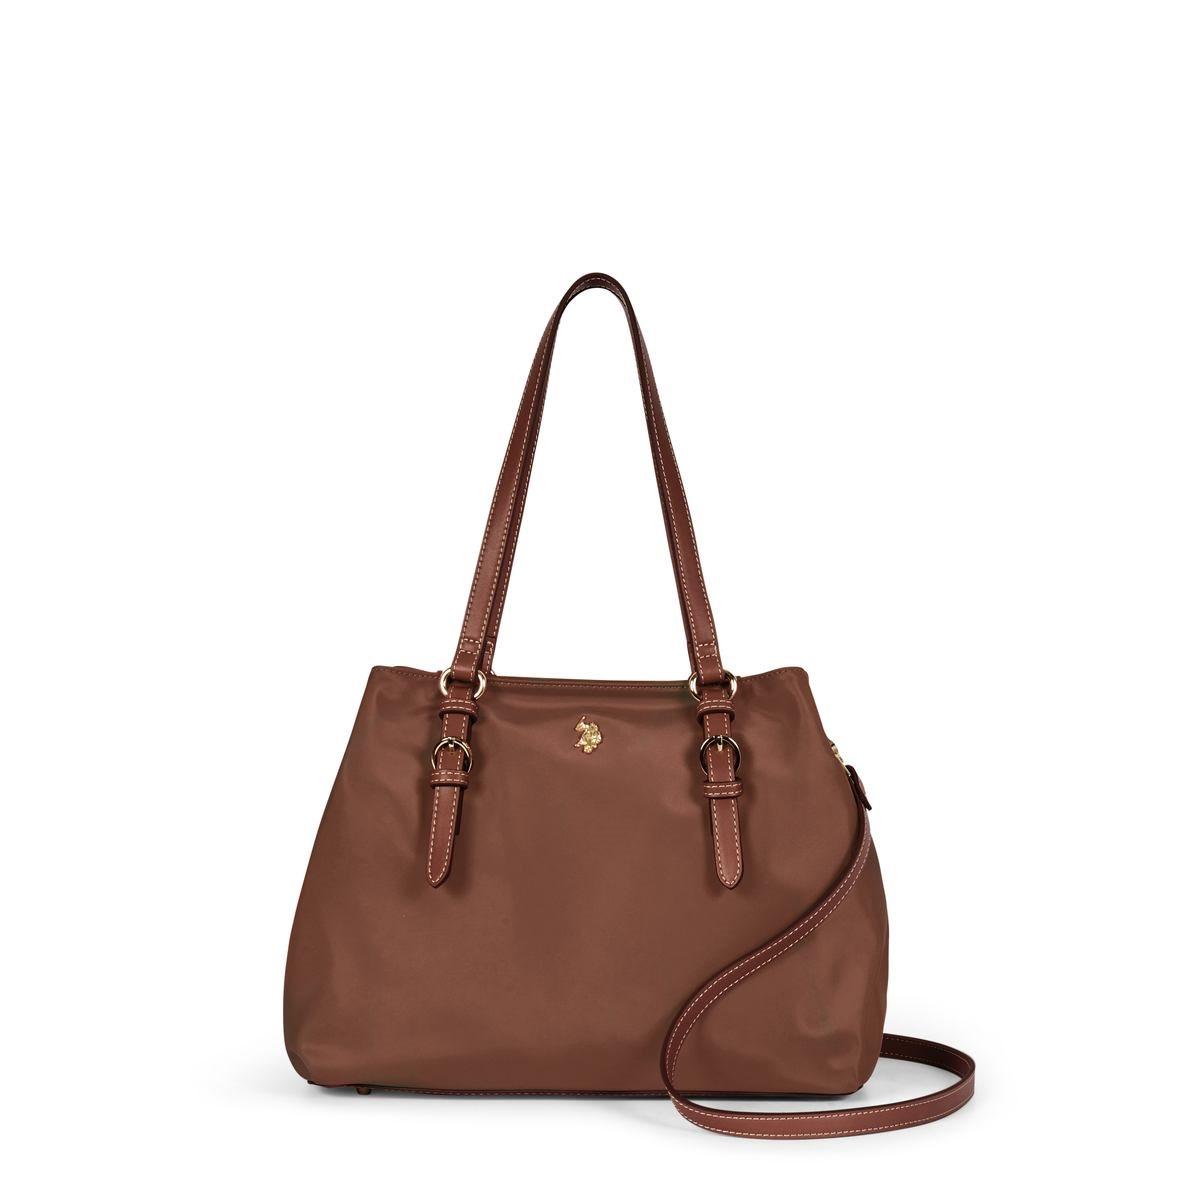 US Polo Assn. Τσάντα χειρός γυναικεία 33x14x24cm Houston Dark Brown